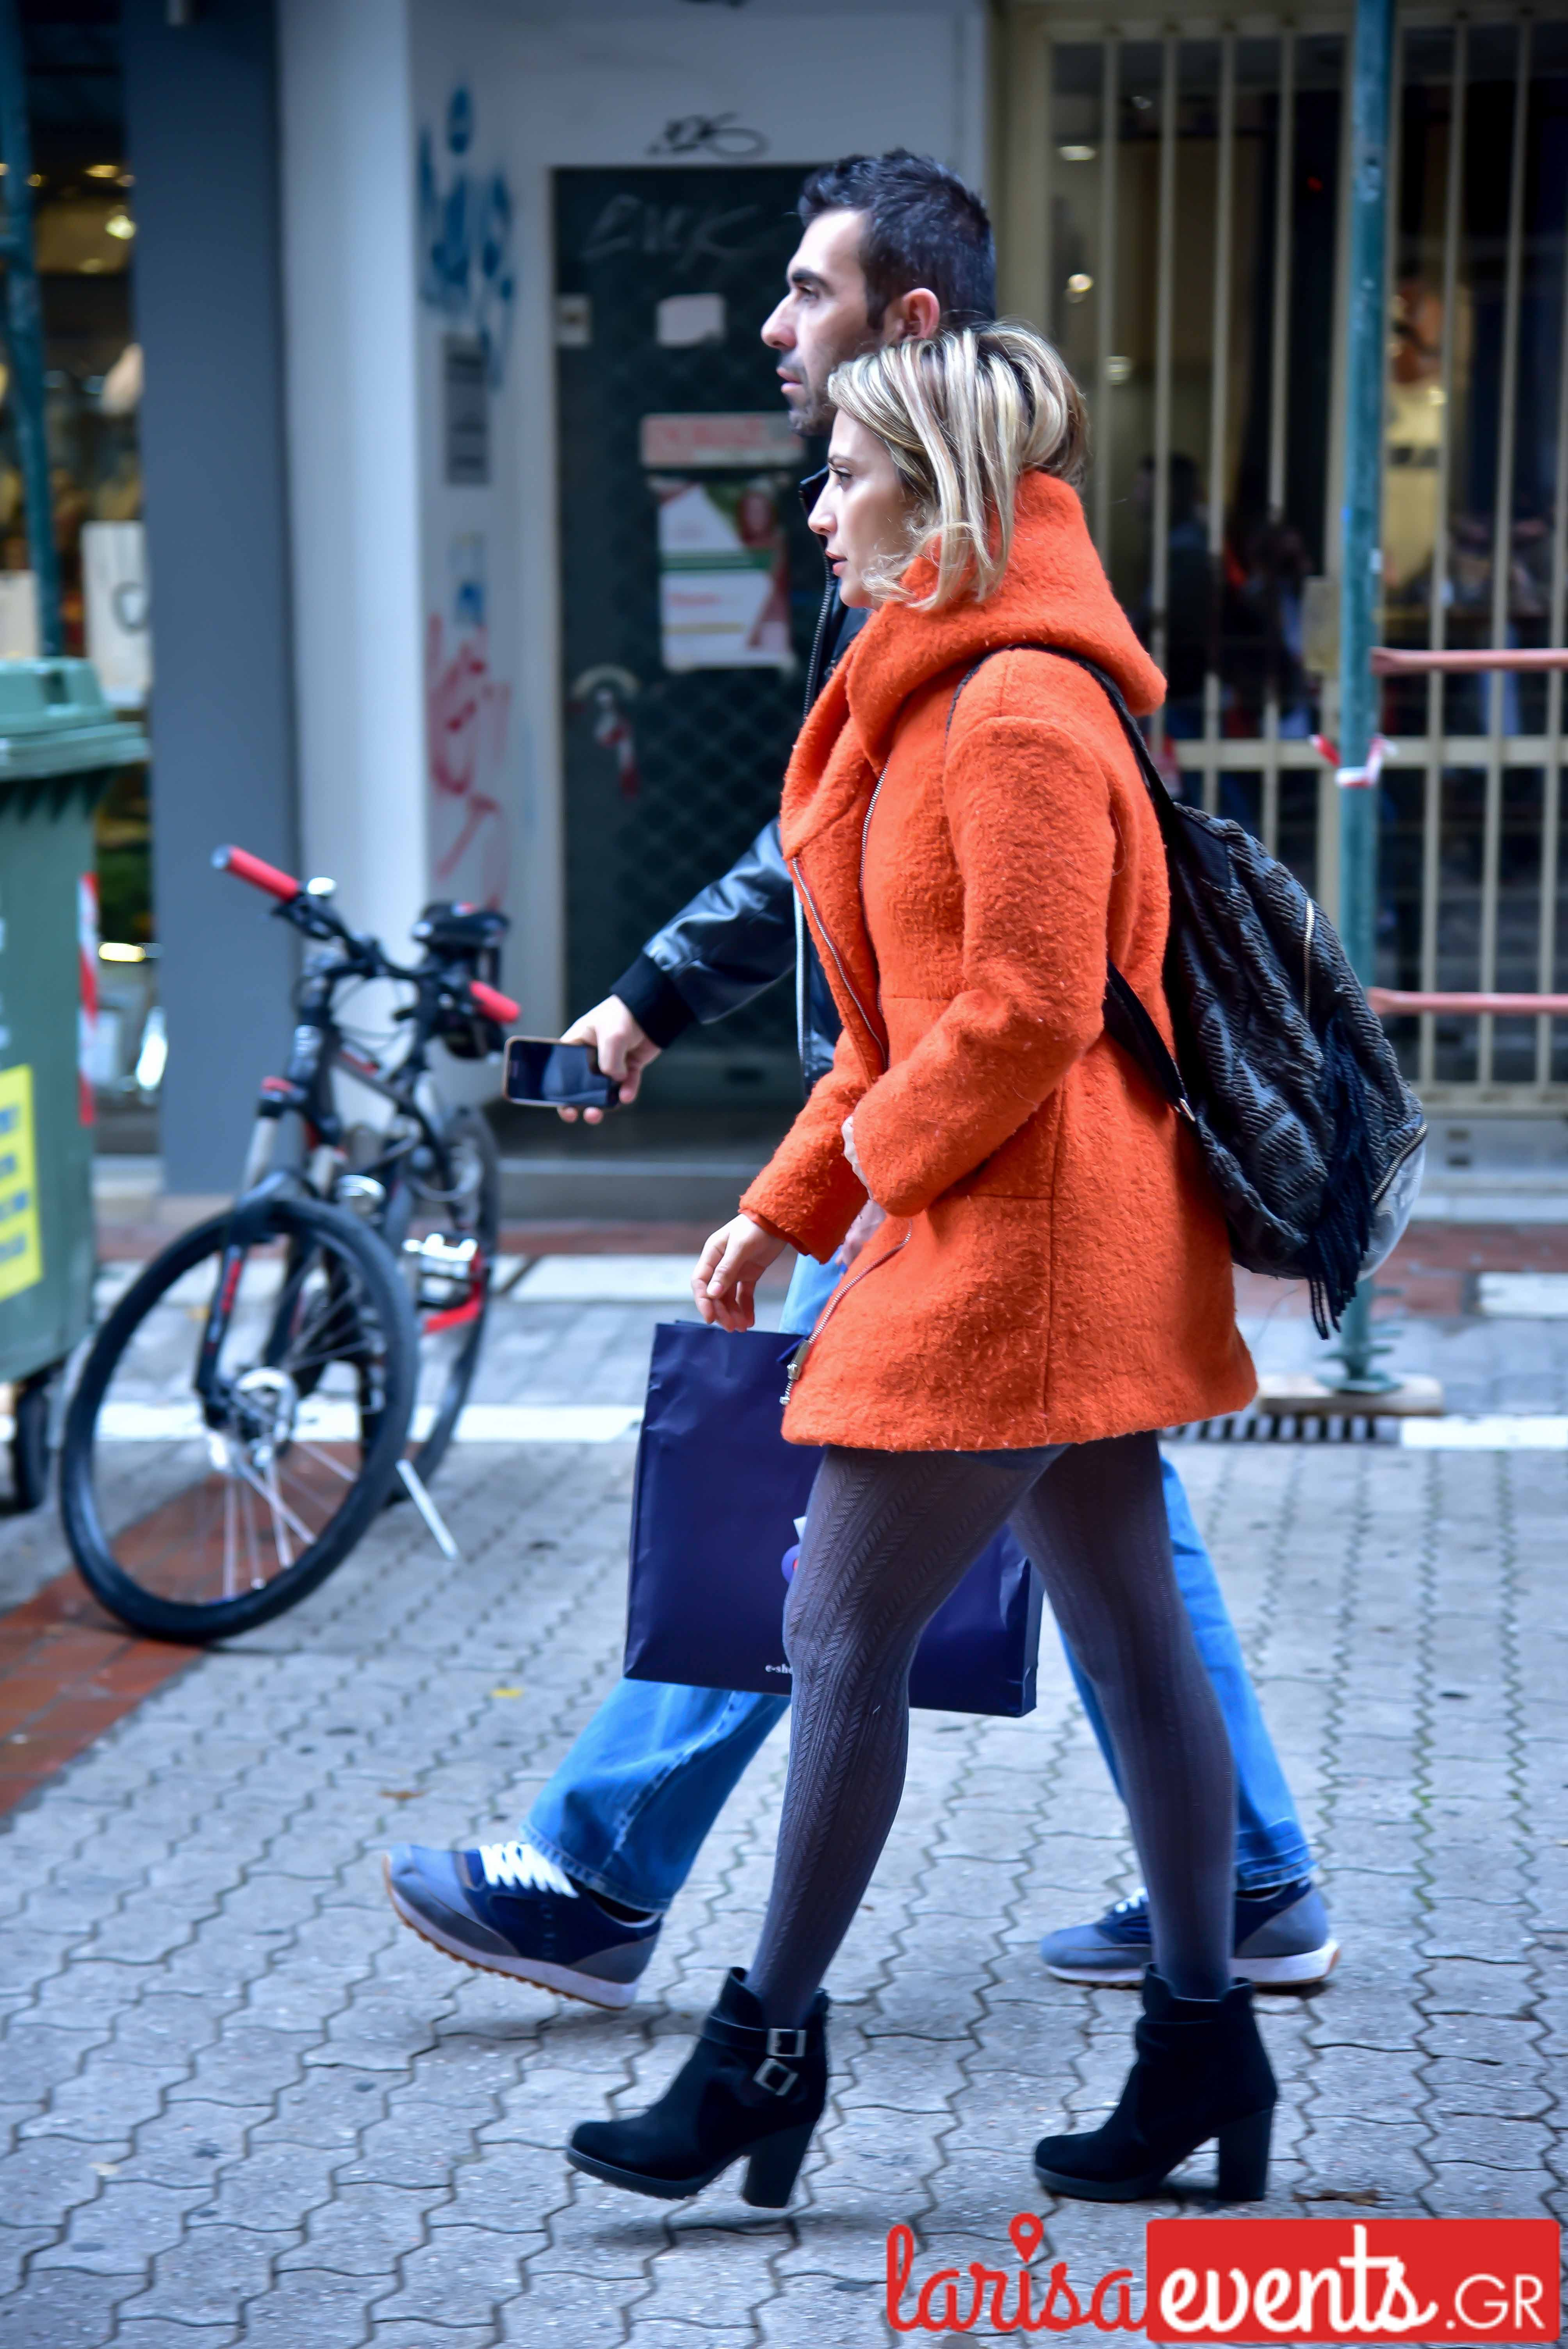 LAZ 6689 - Λάρισα's Street Style | Οι Λαρισαίοι σε street style clicks!